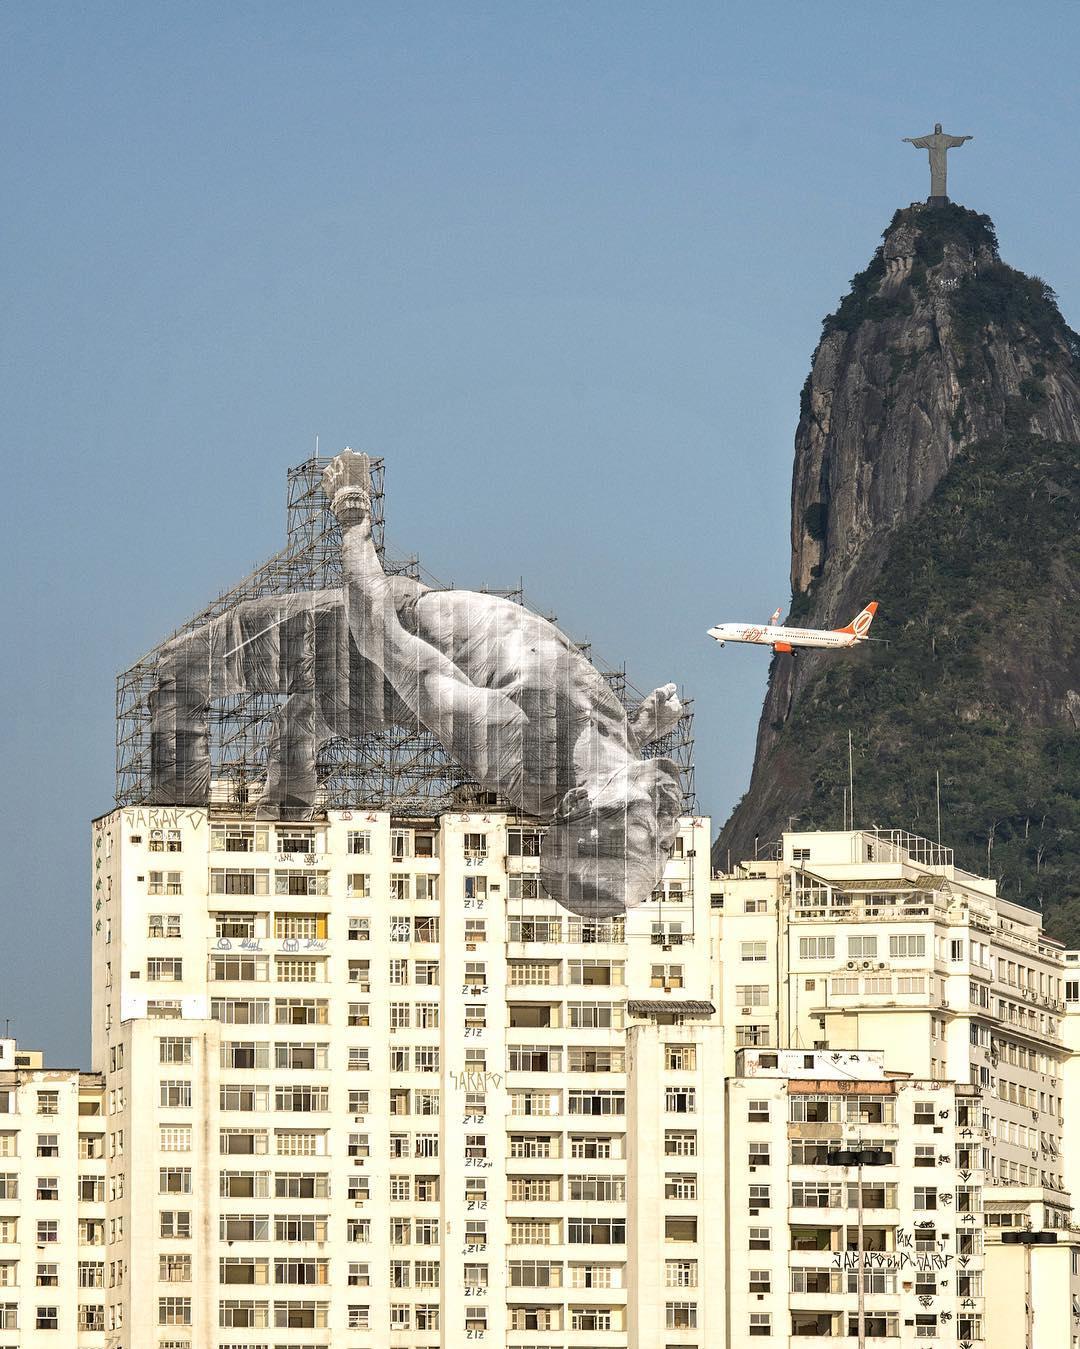 Installation by JR in Rio (photo via @jr/Instagram)